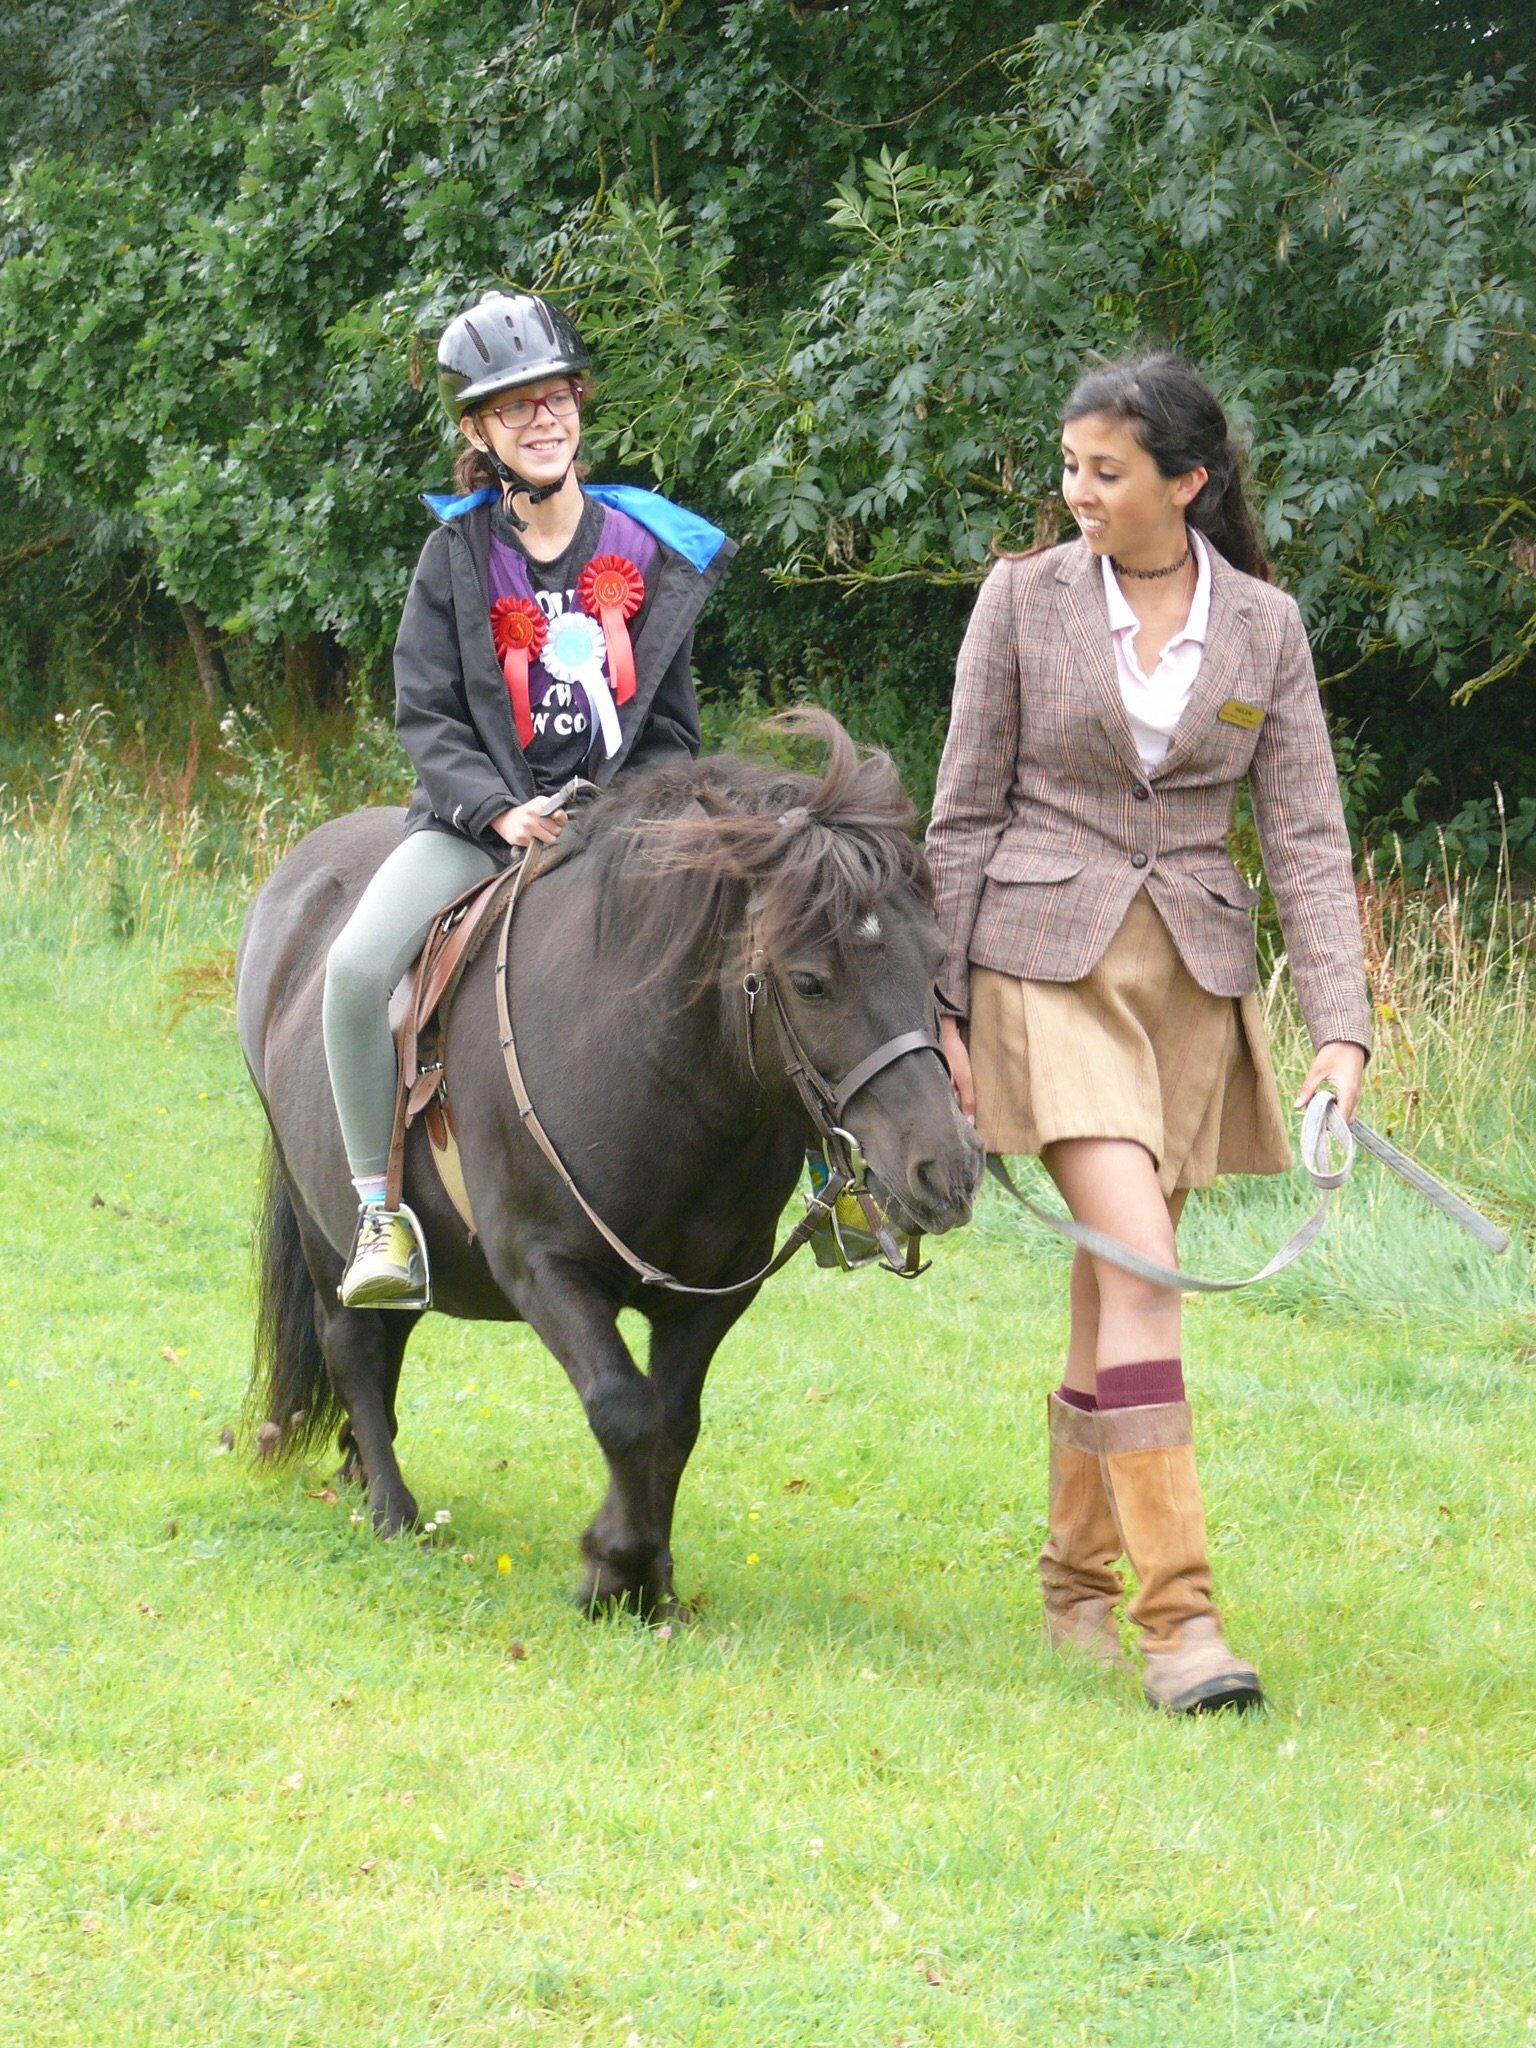 Pony Riding at Shetland Pony Club